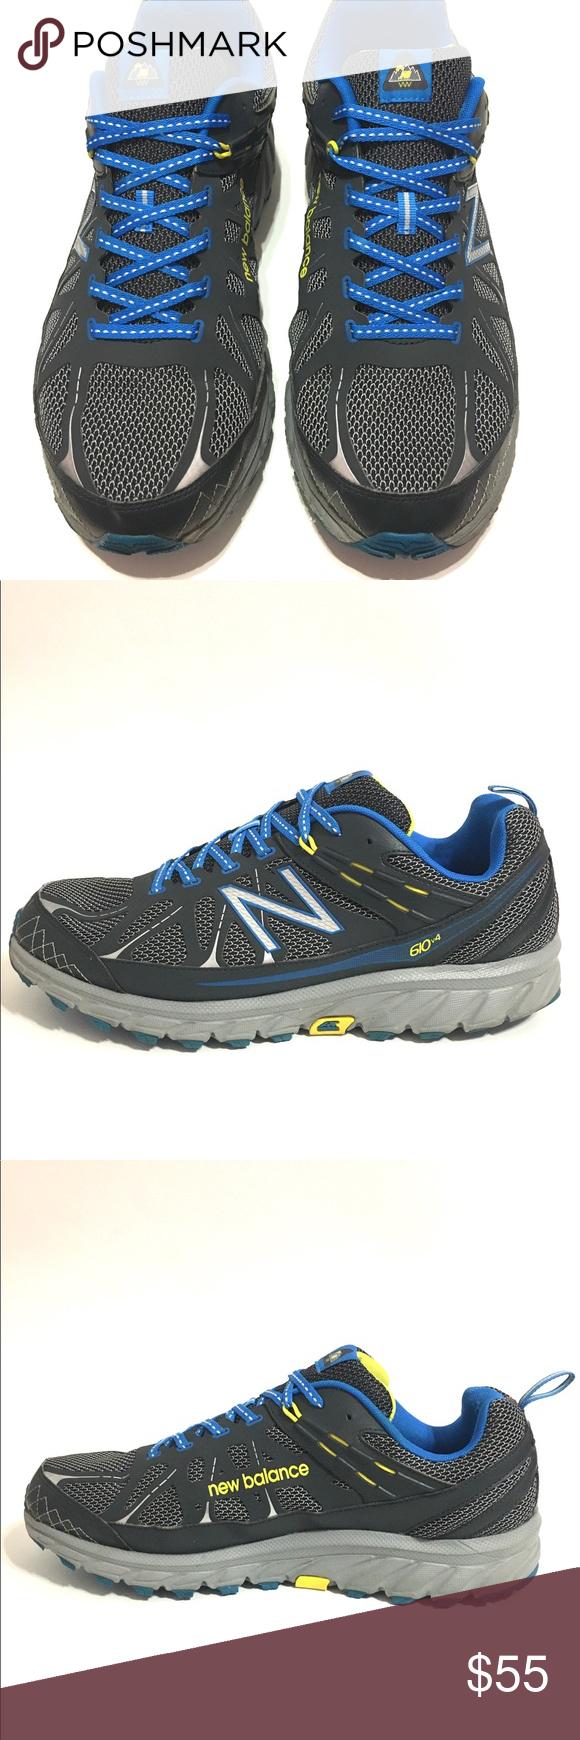 New Balance All Terrain Hiking Shoes US